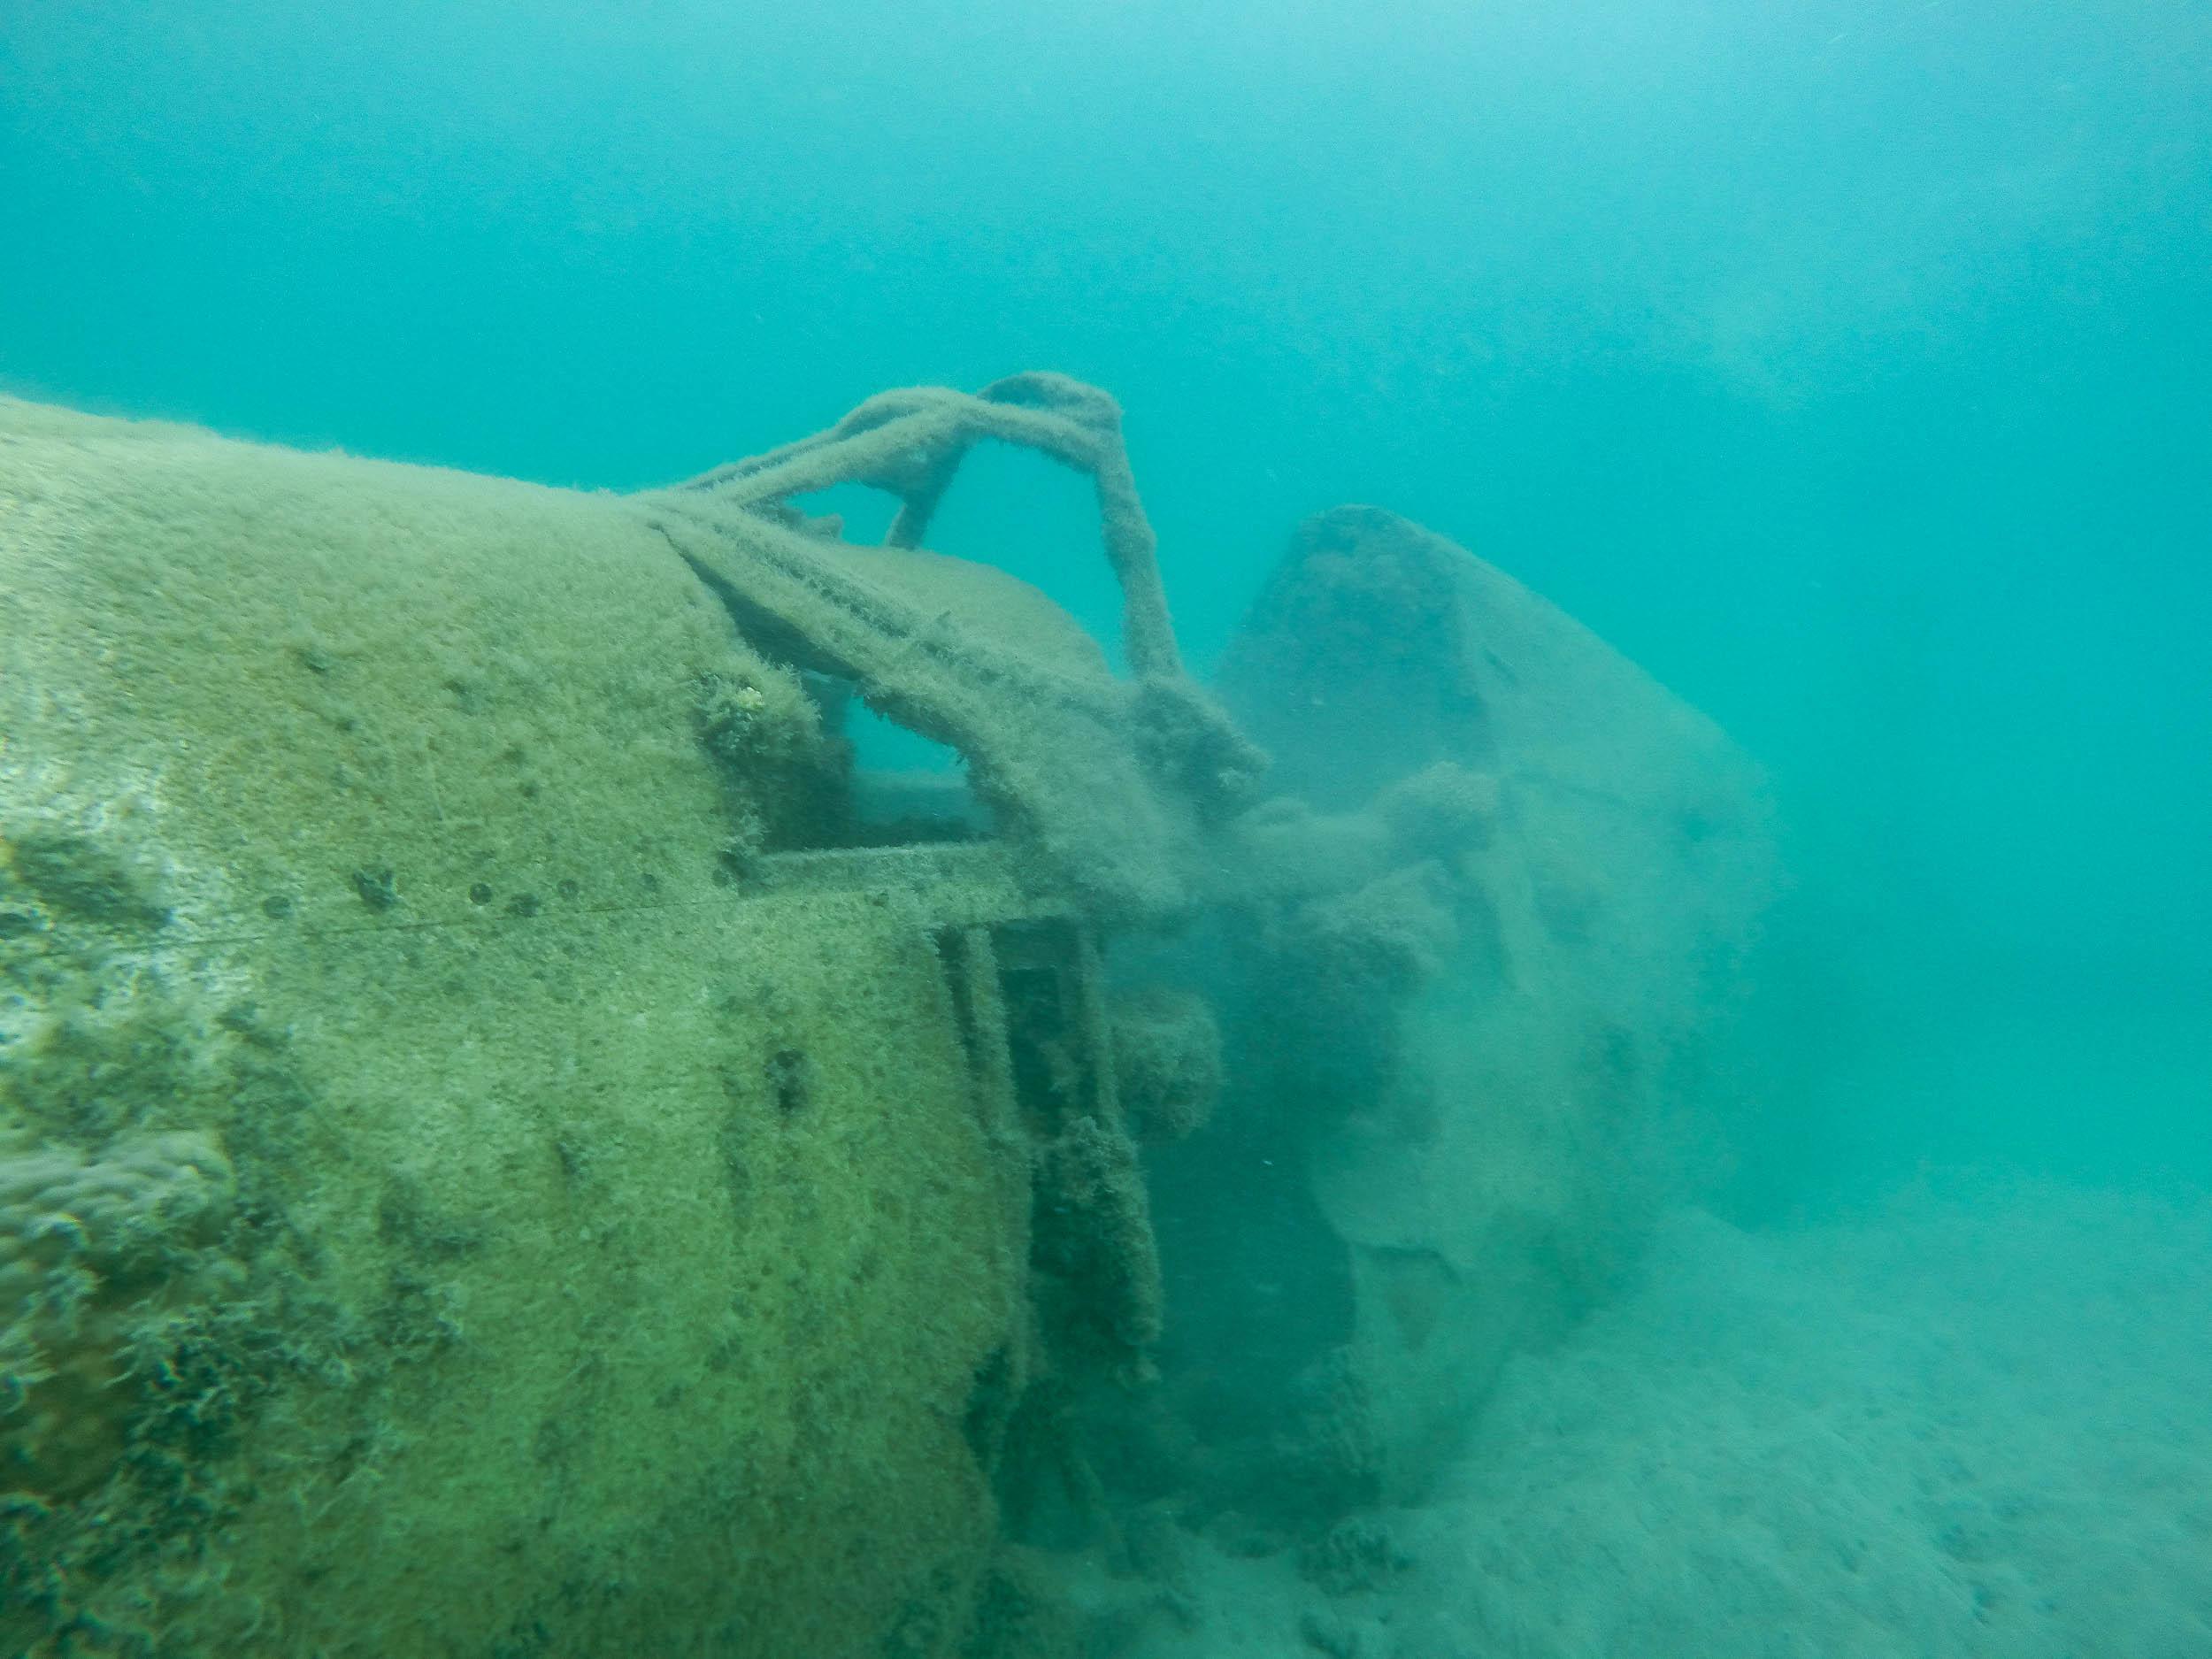 Snorkel on a World Ware 2 Plane Wreck (Forward Fuselage)